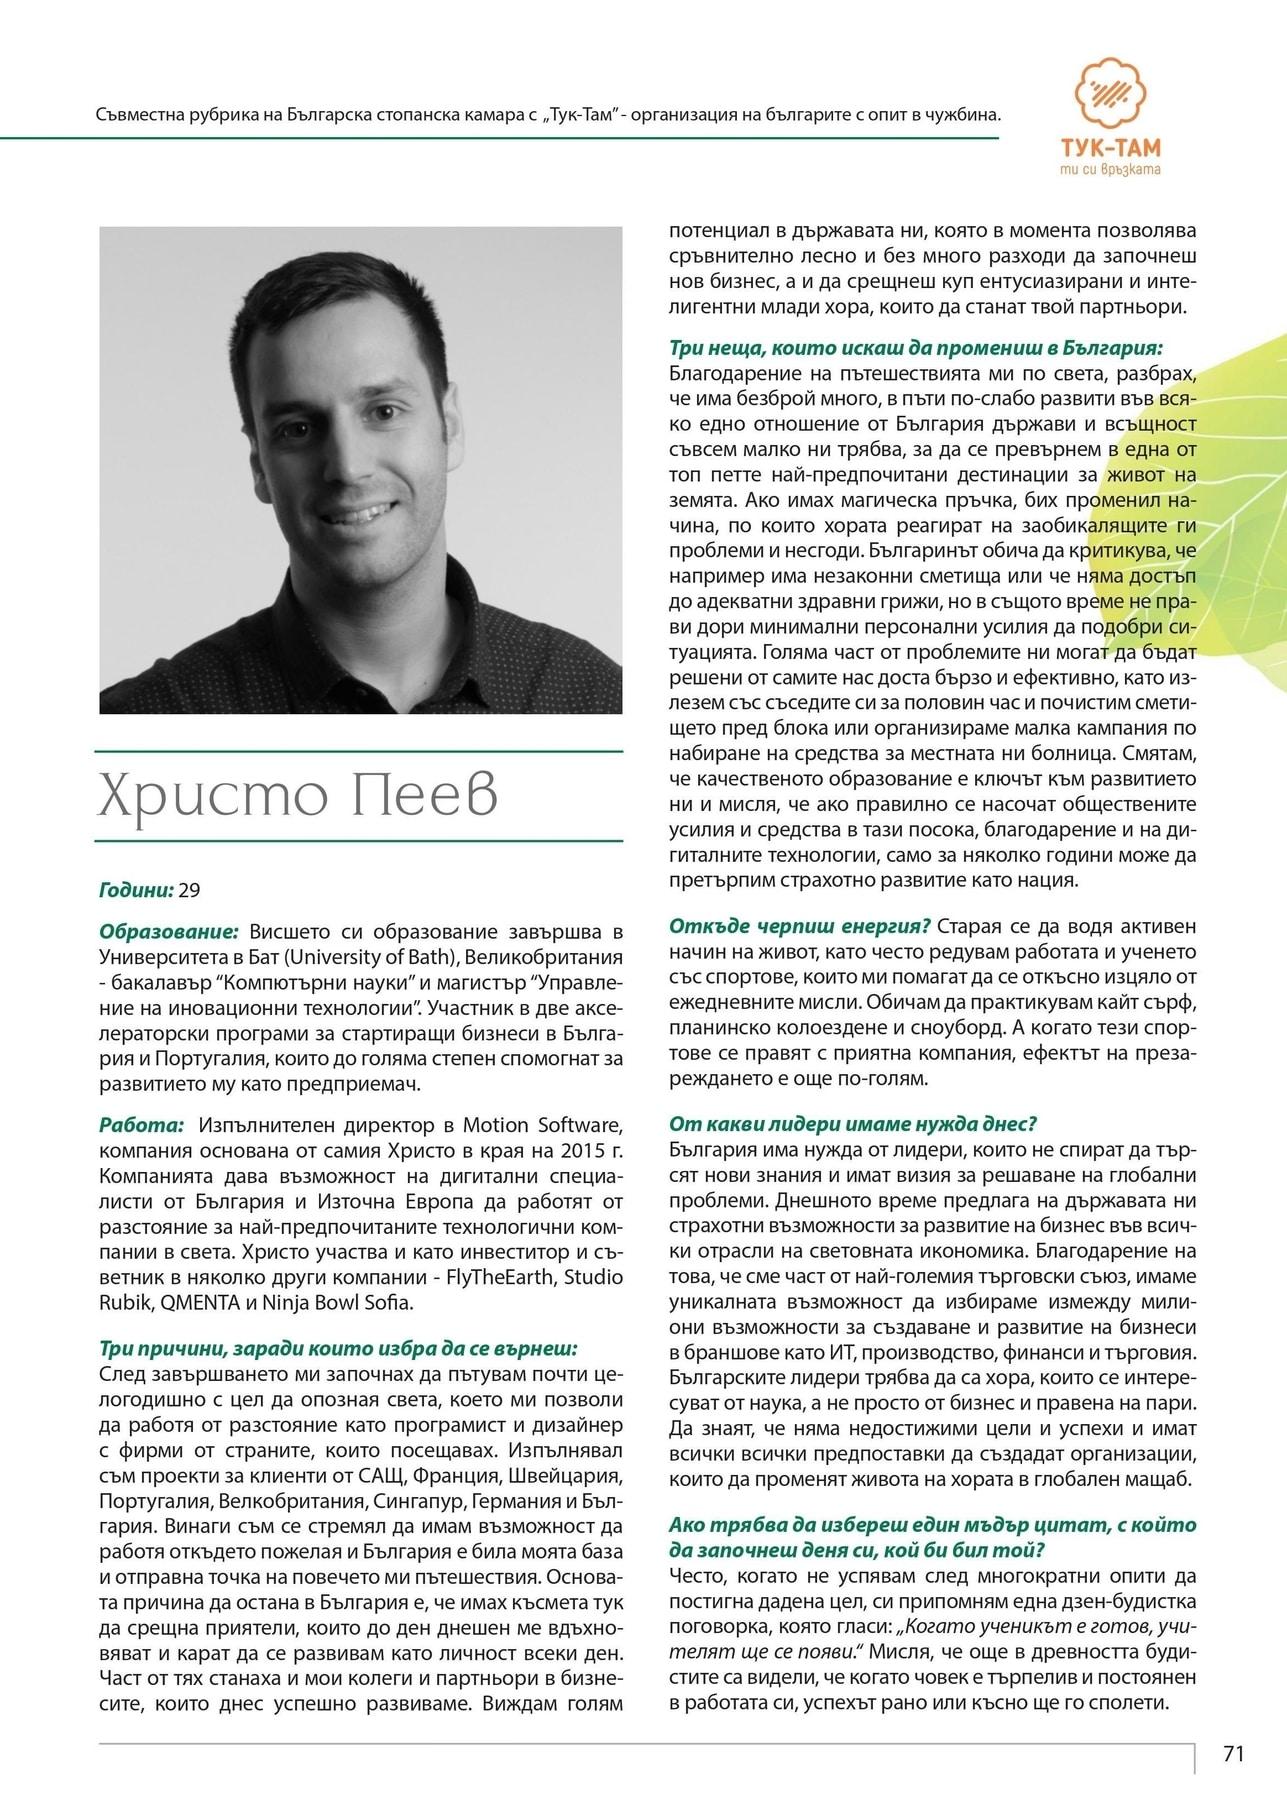 bulgarian industrial association interview